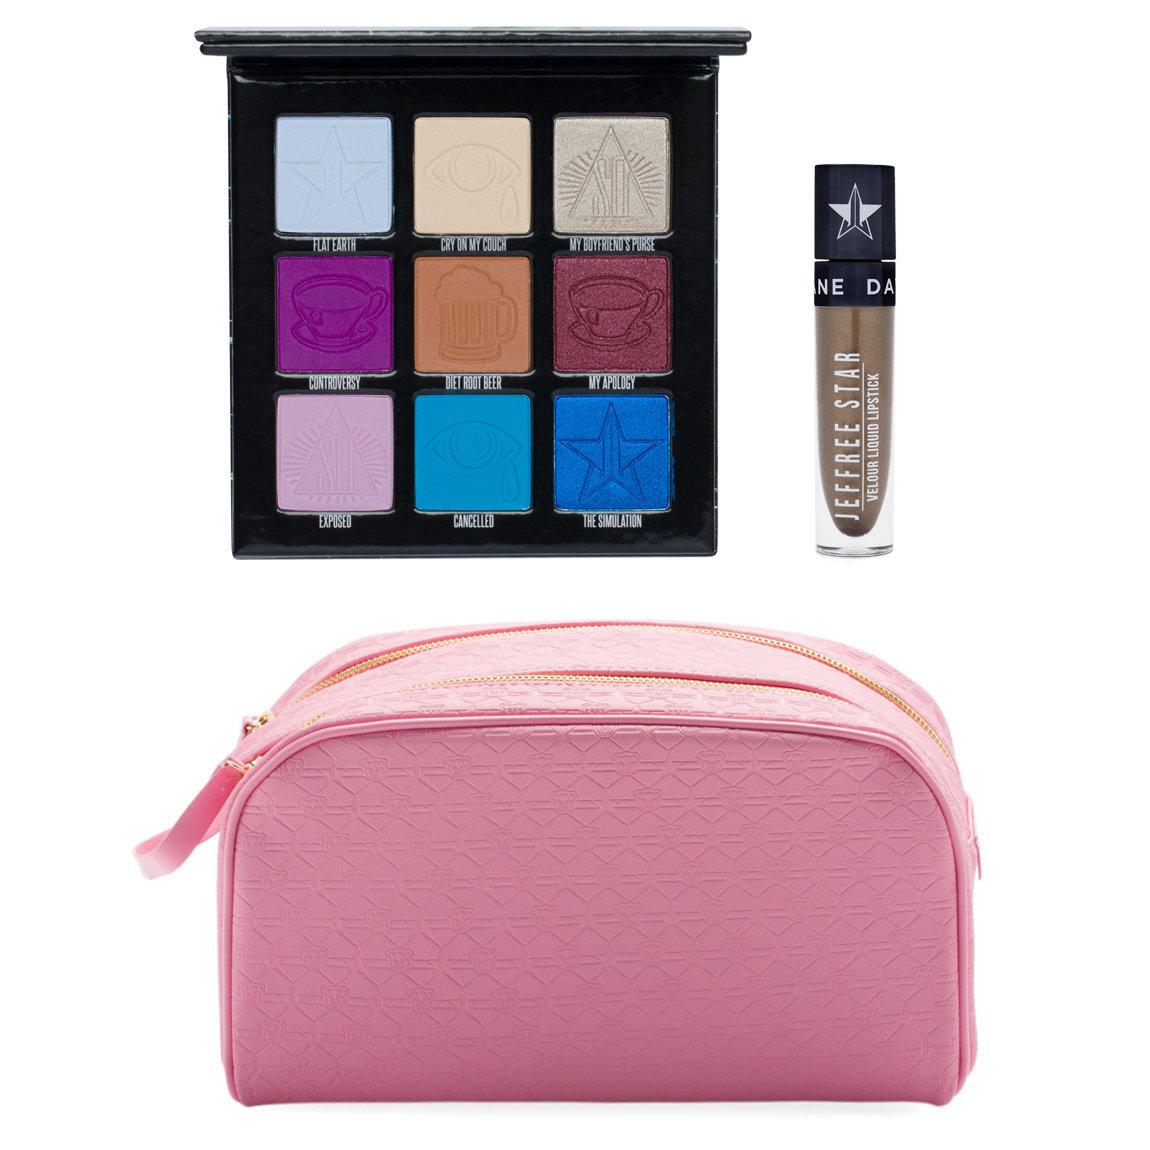 Jeffree Star Cosmetics Mini Controversy + Shane Velour Liquid Lipstick & Pink Double Zip Bag product swatch.